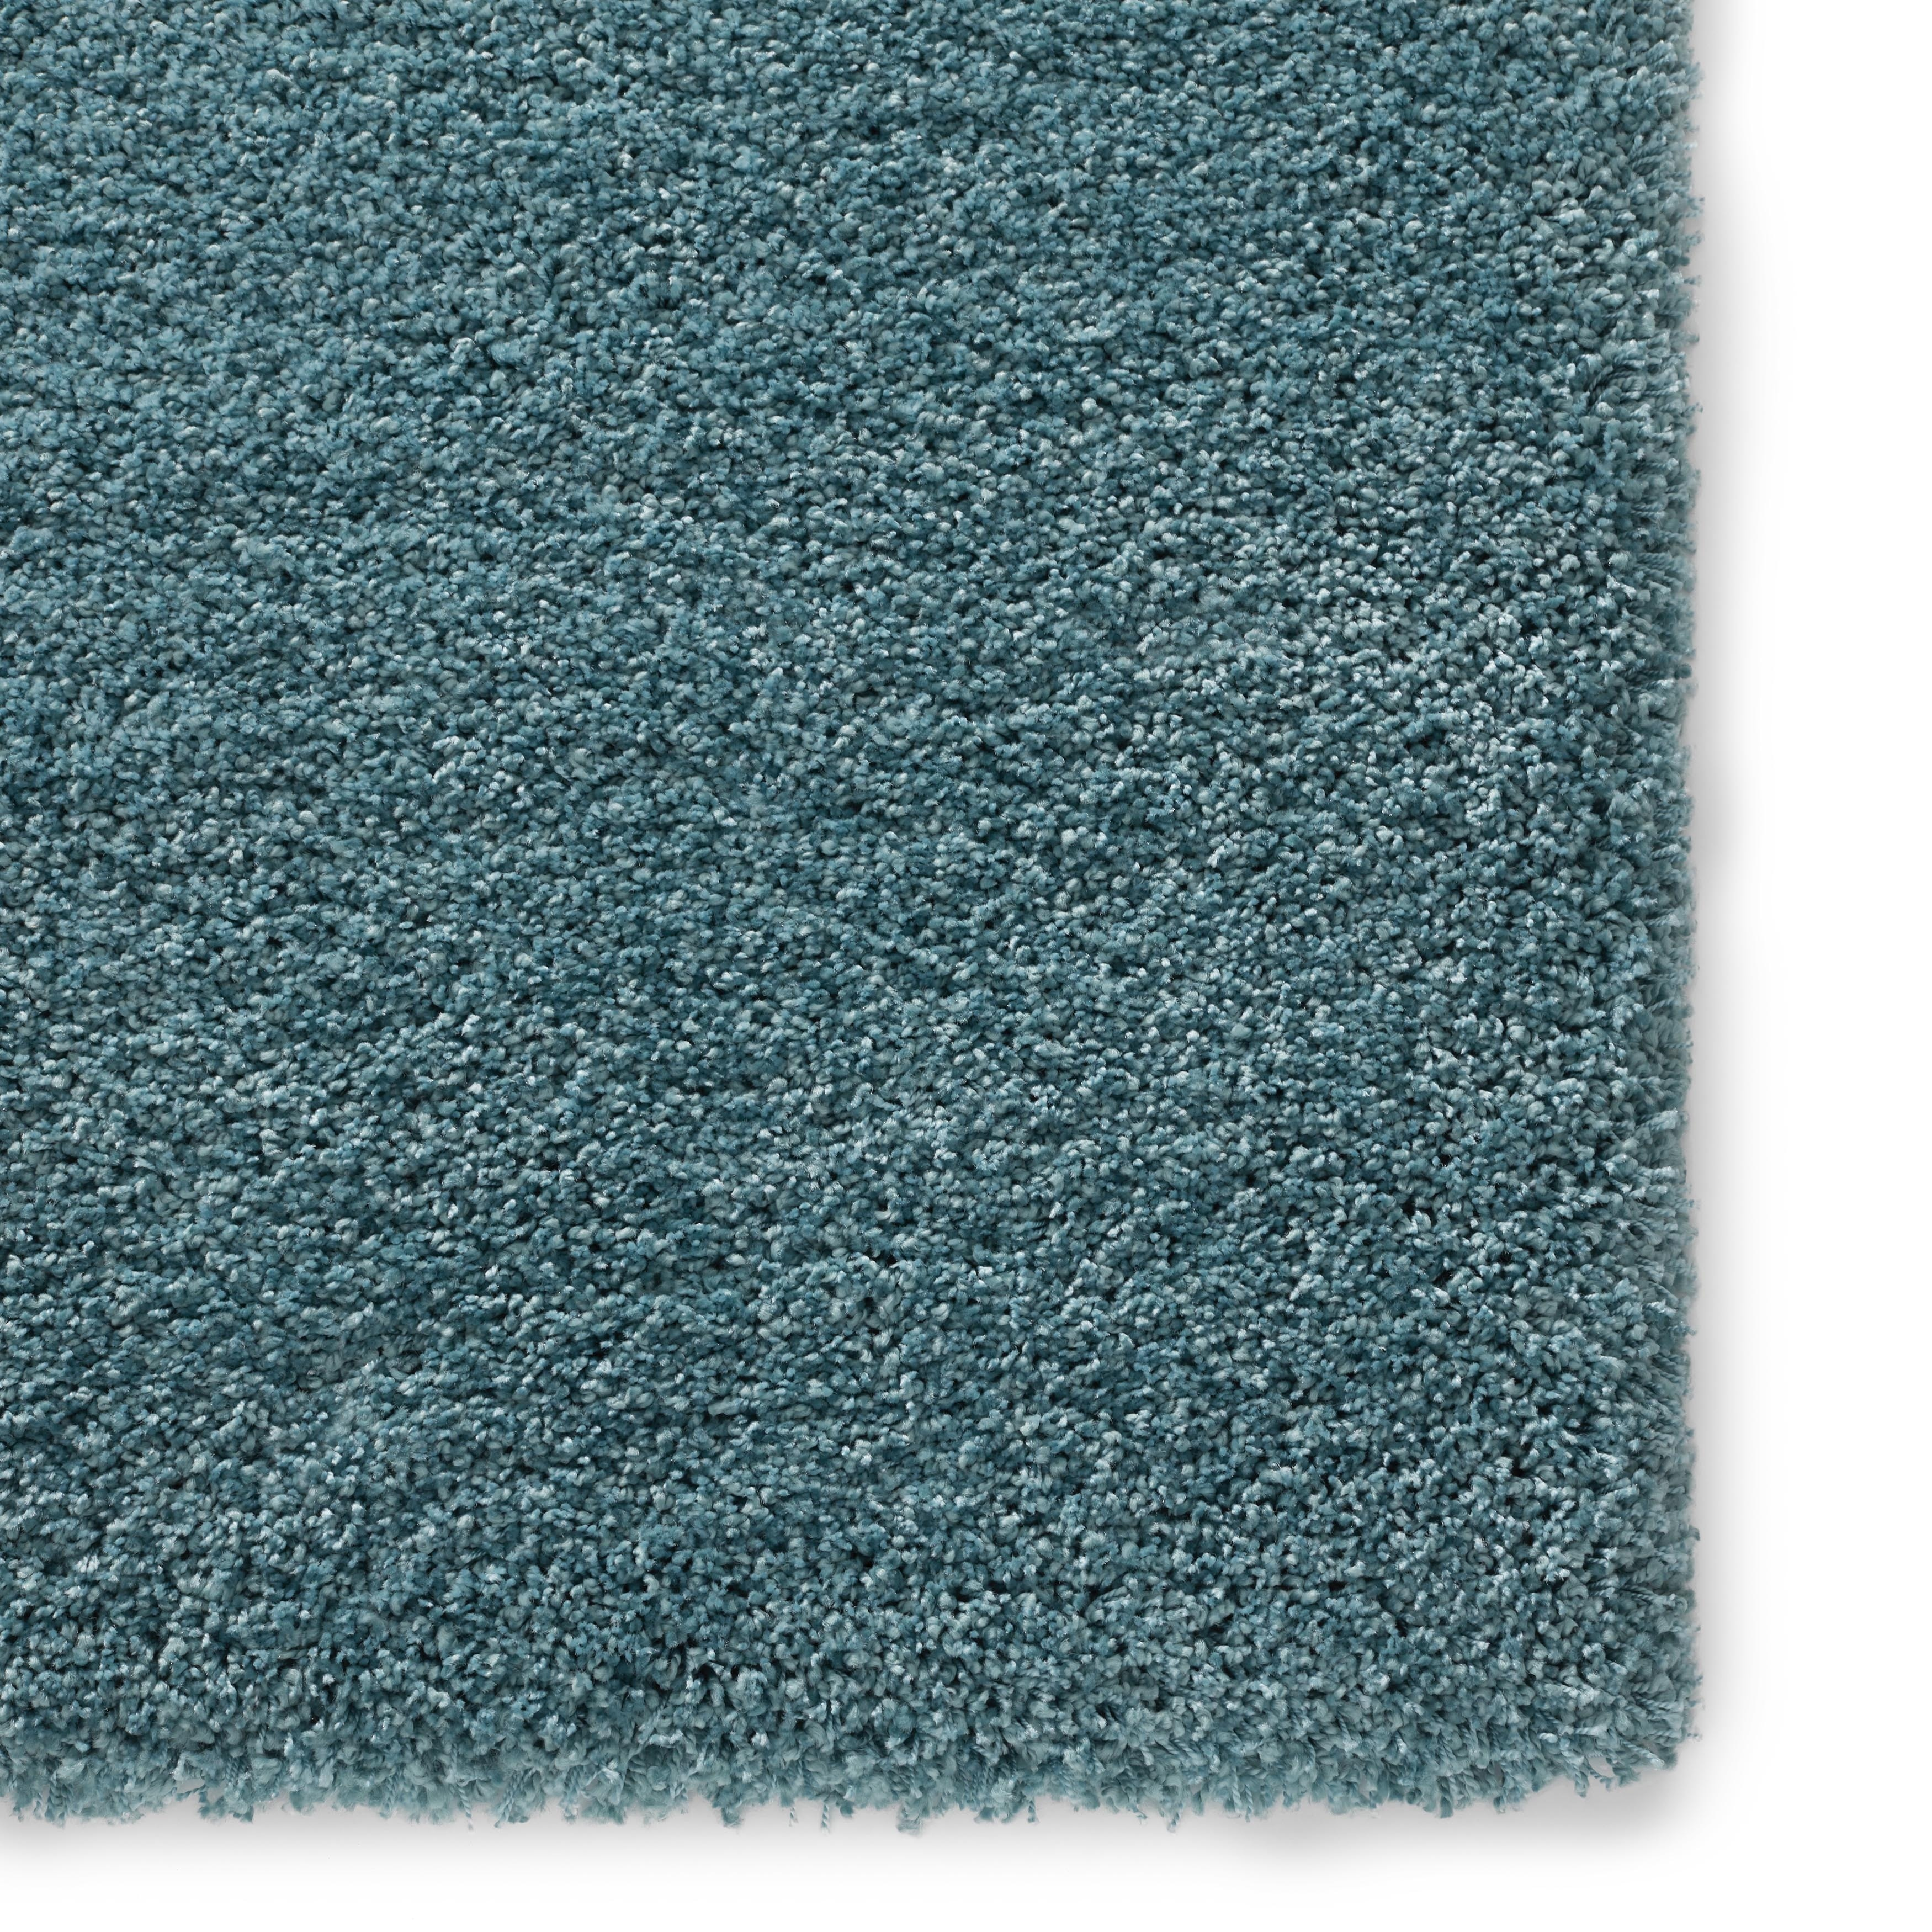 blue rug texture. Safavieh Milan Shag Aqua Blue Rug - 8\u00276 X 12\u0027 Free Shipping Today Overstock 15703437 Texture U